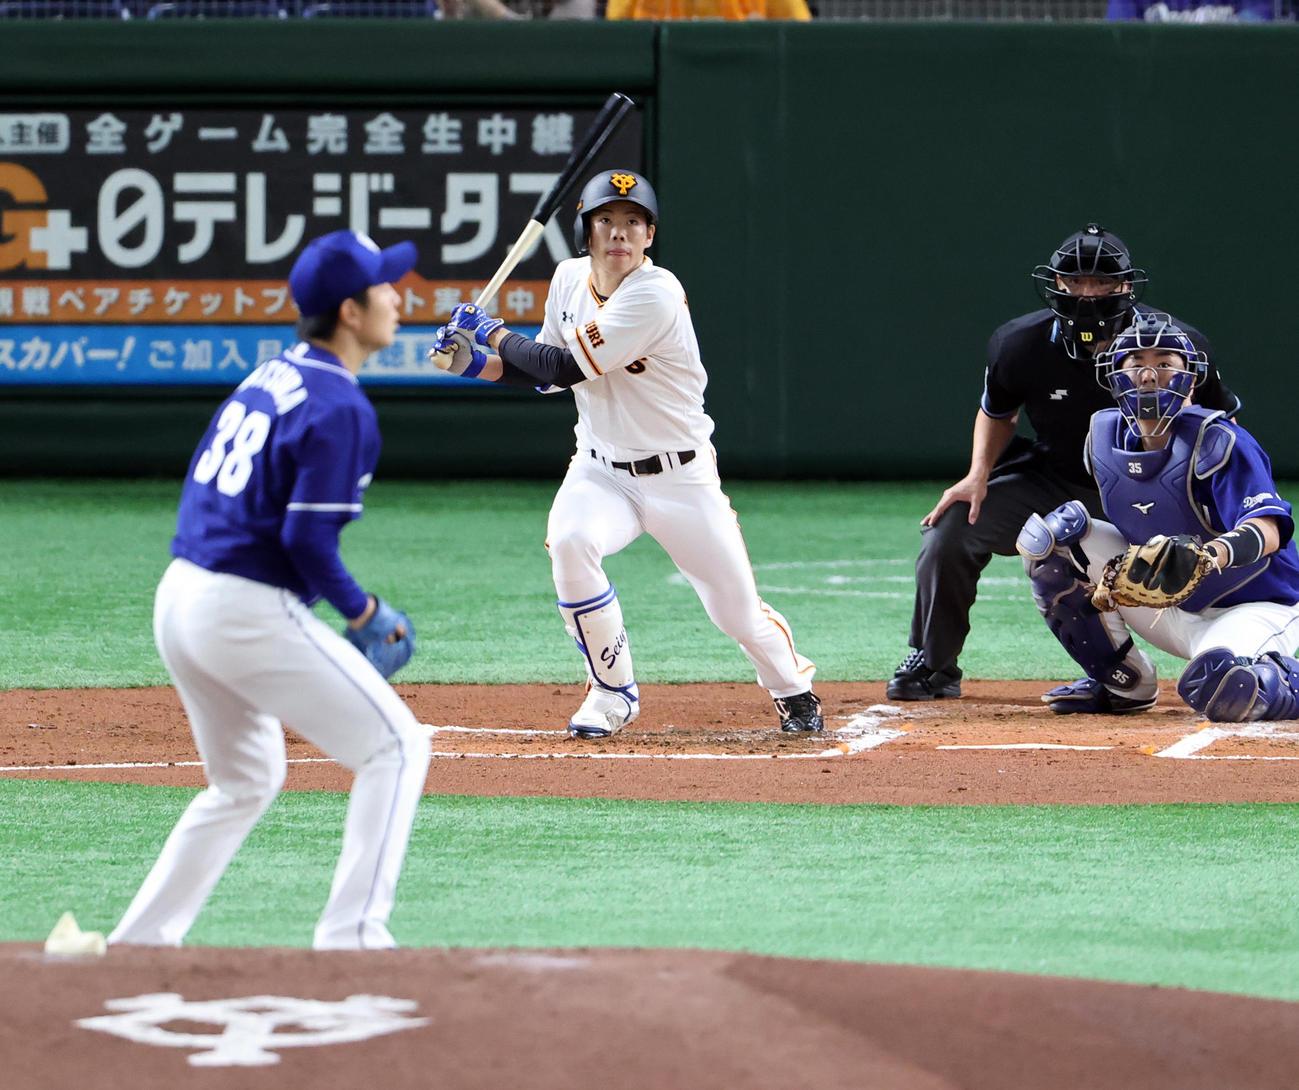 巨人対中日 1回裏巨人無死二塁、松原は中越え適時三塁打を放つ。投手松葉(撮影・浅見桂子)